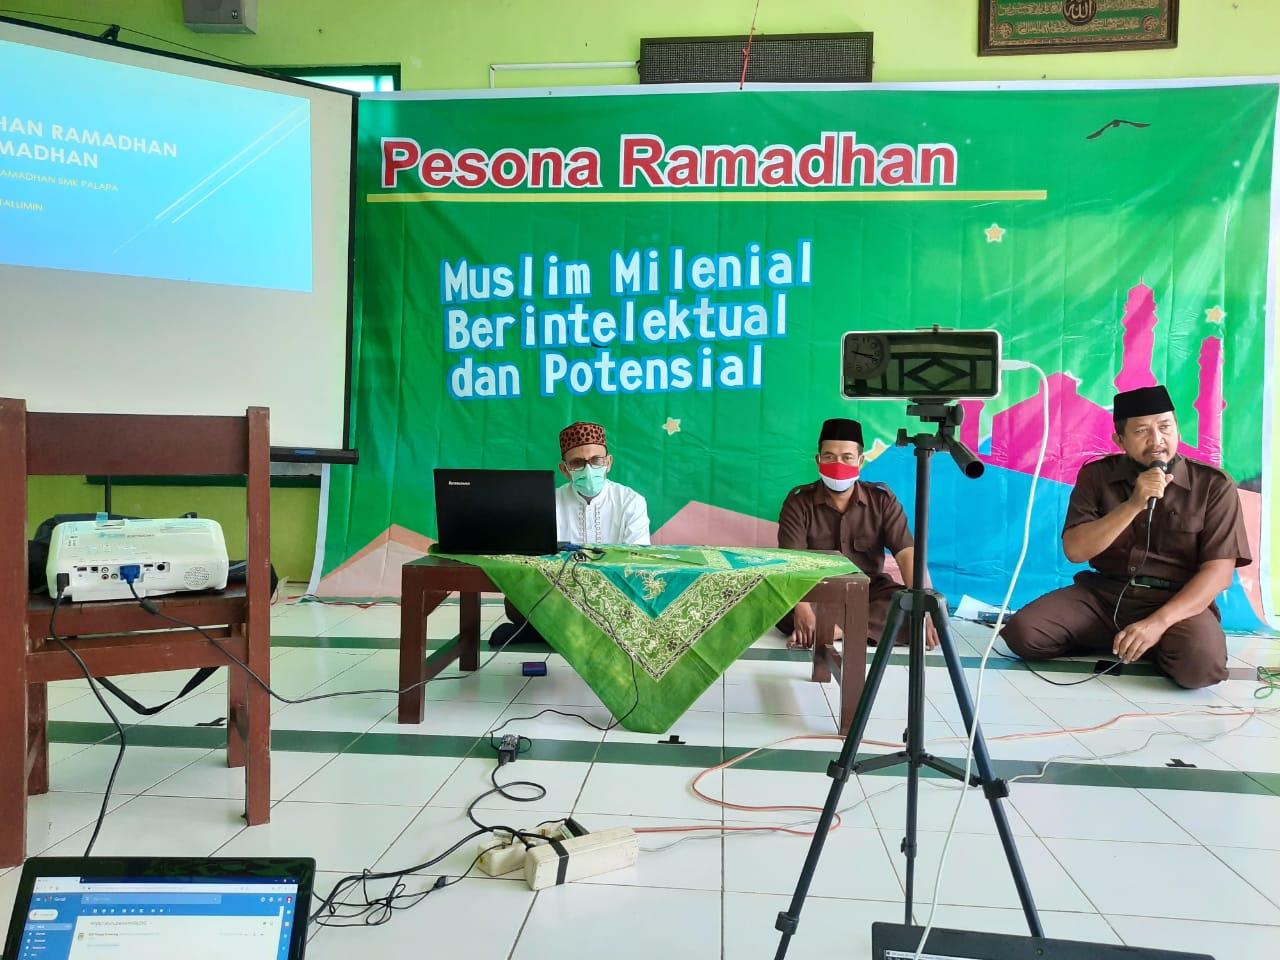 Pesona Ramadhan SMK Palapa